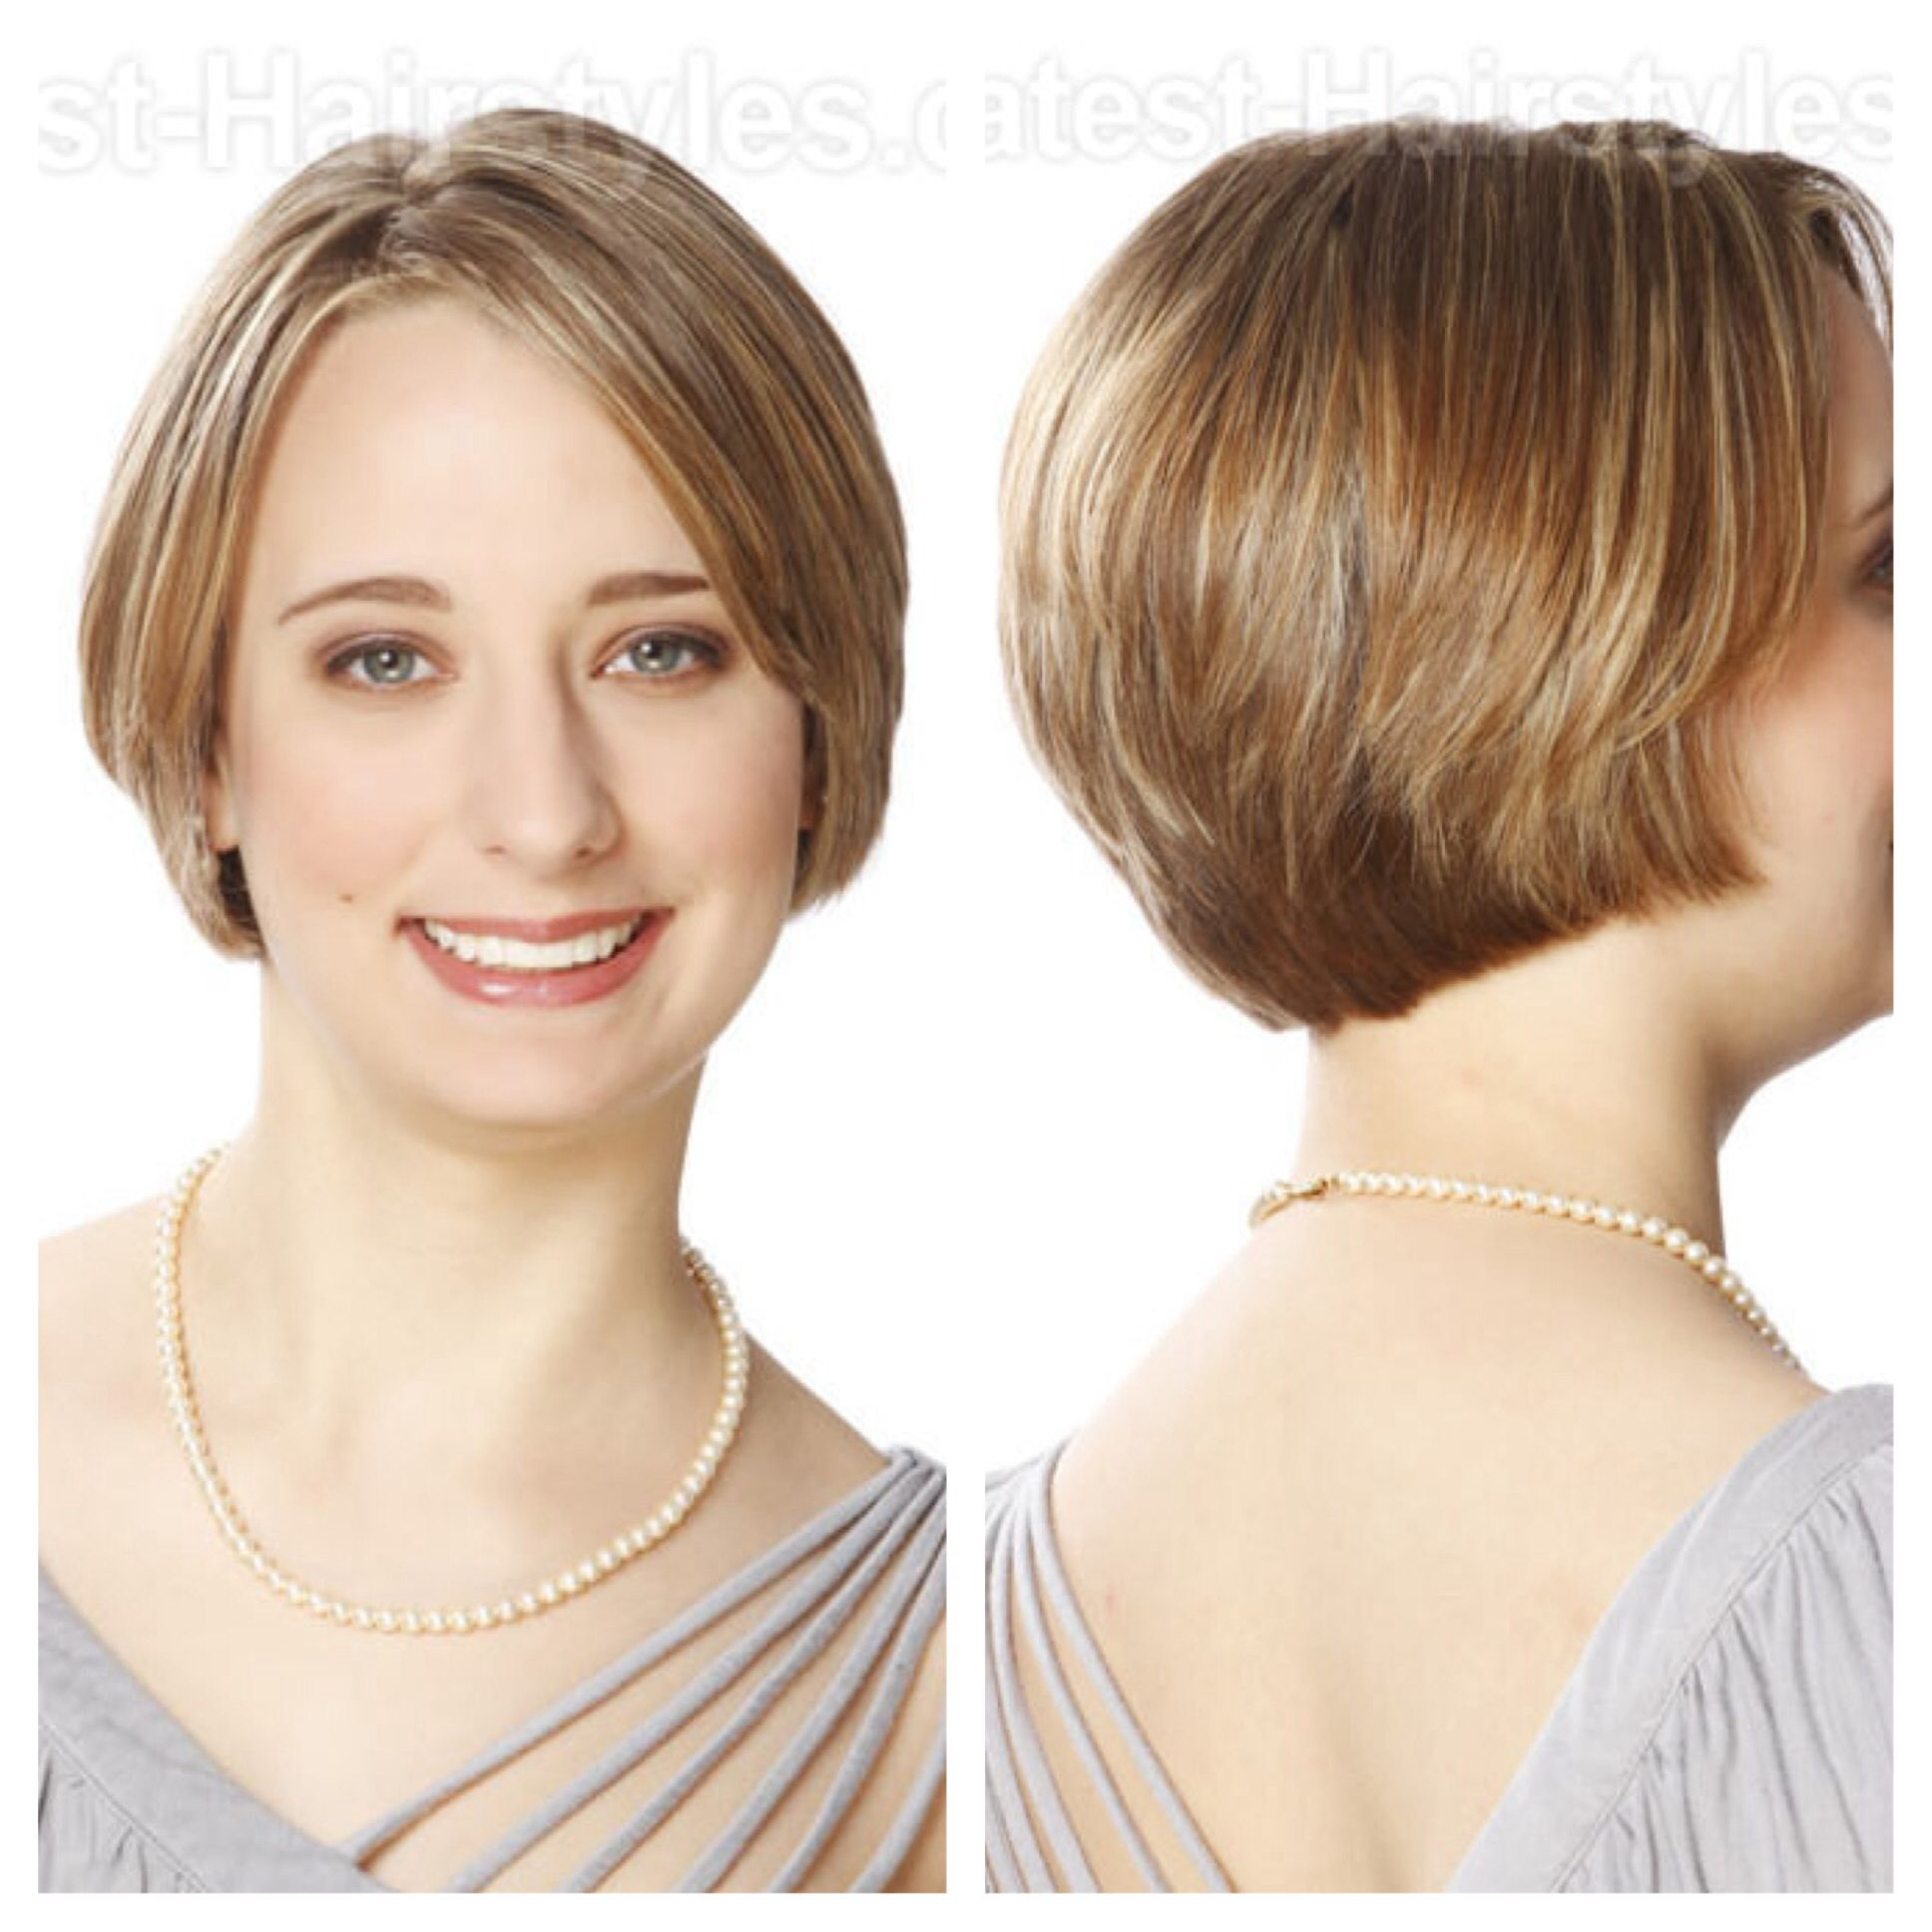 shorthair Hairstyles for Short Hair Pinterest